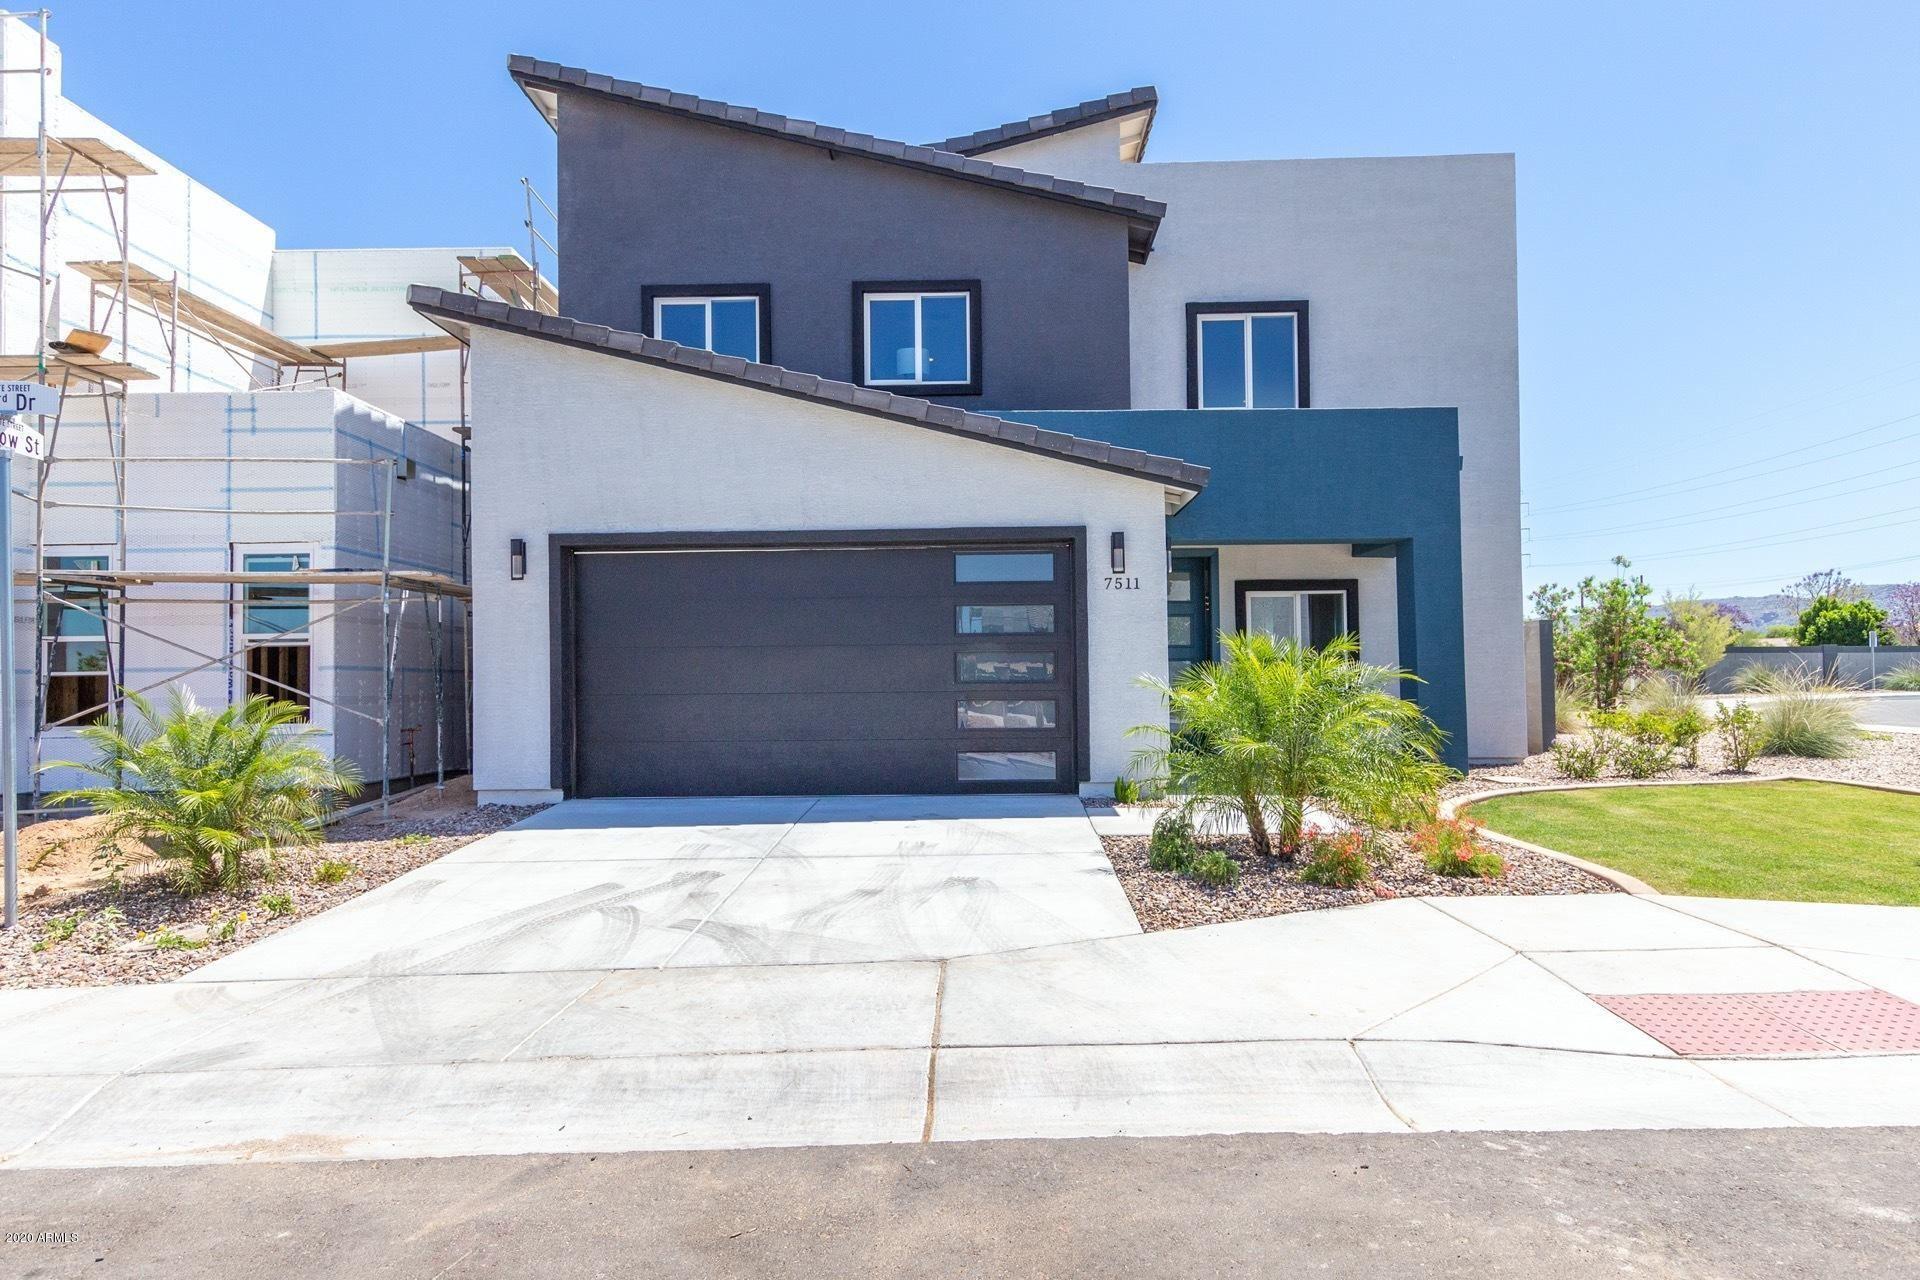 7511 S 23RD Drive, Phoenix, AZ 85041 - MLS#: 5967175